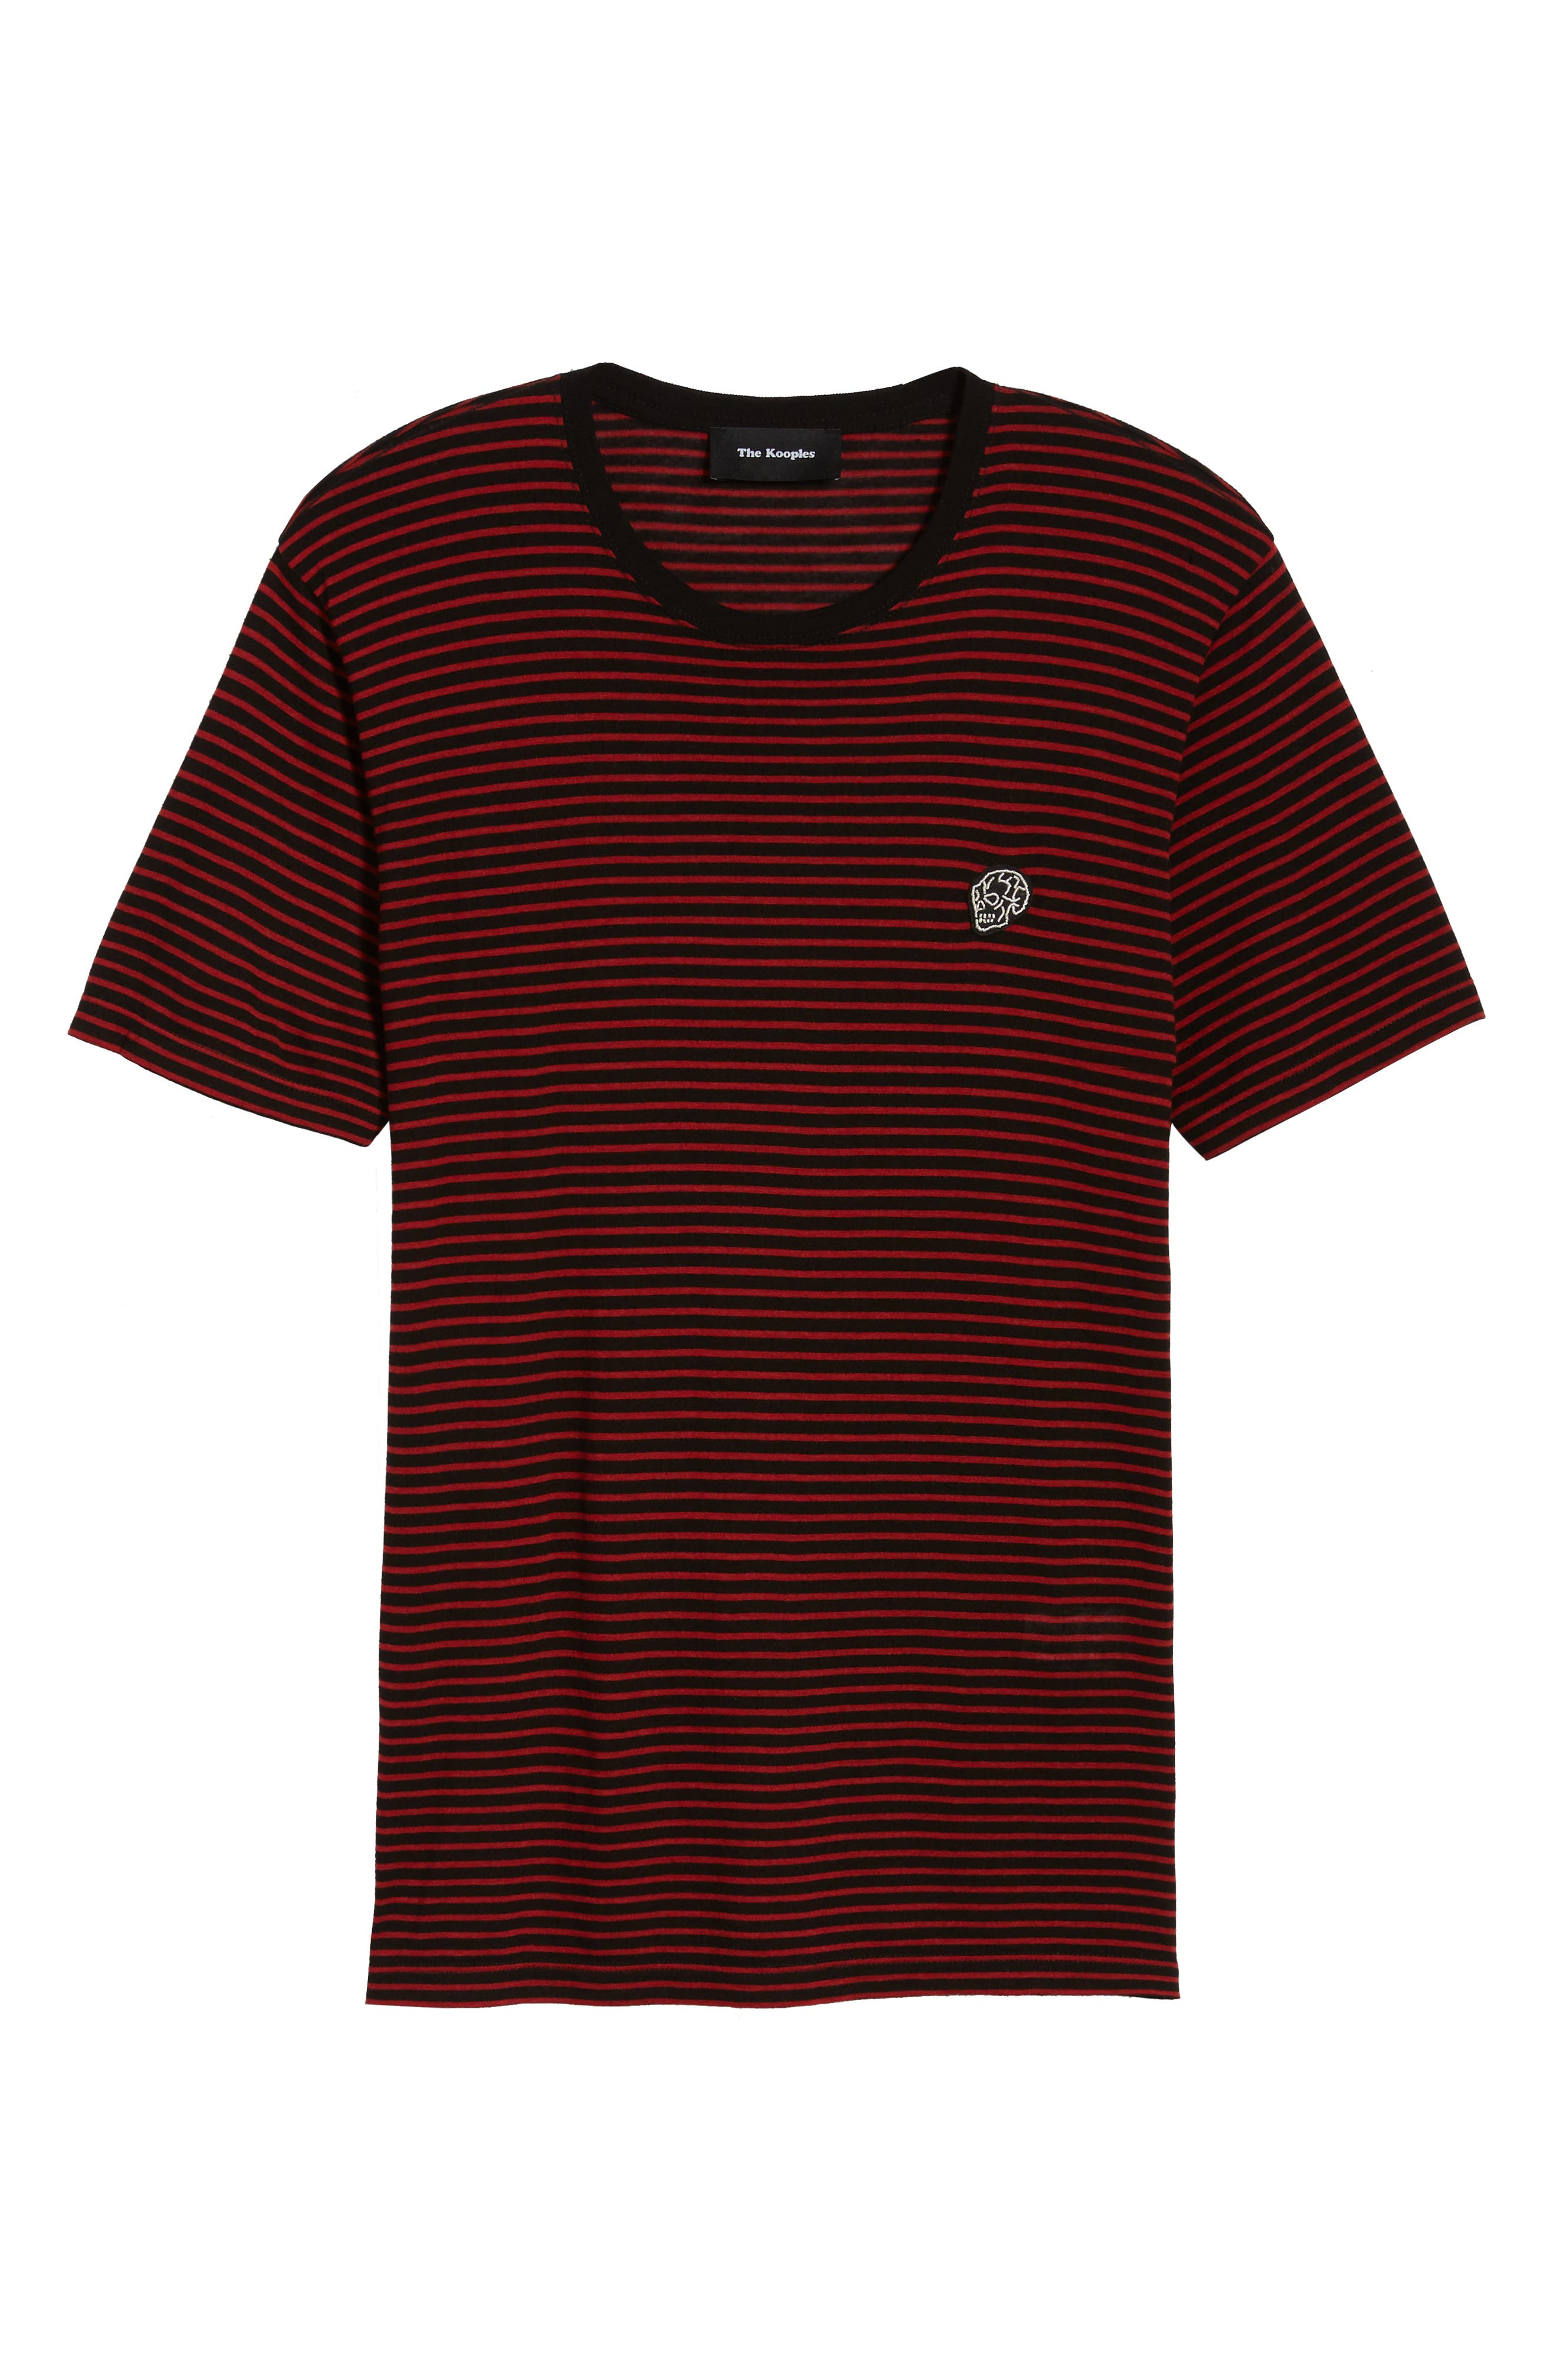 Skull Appliqué Striped Wool Blend T-Shirt,                             Alternate thumbnail 6, color,                             001